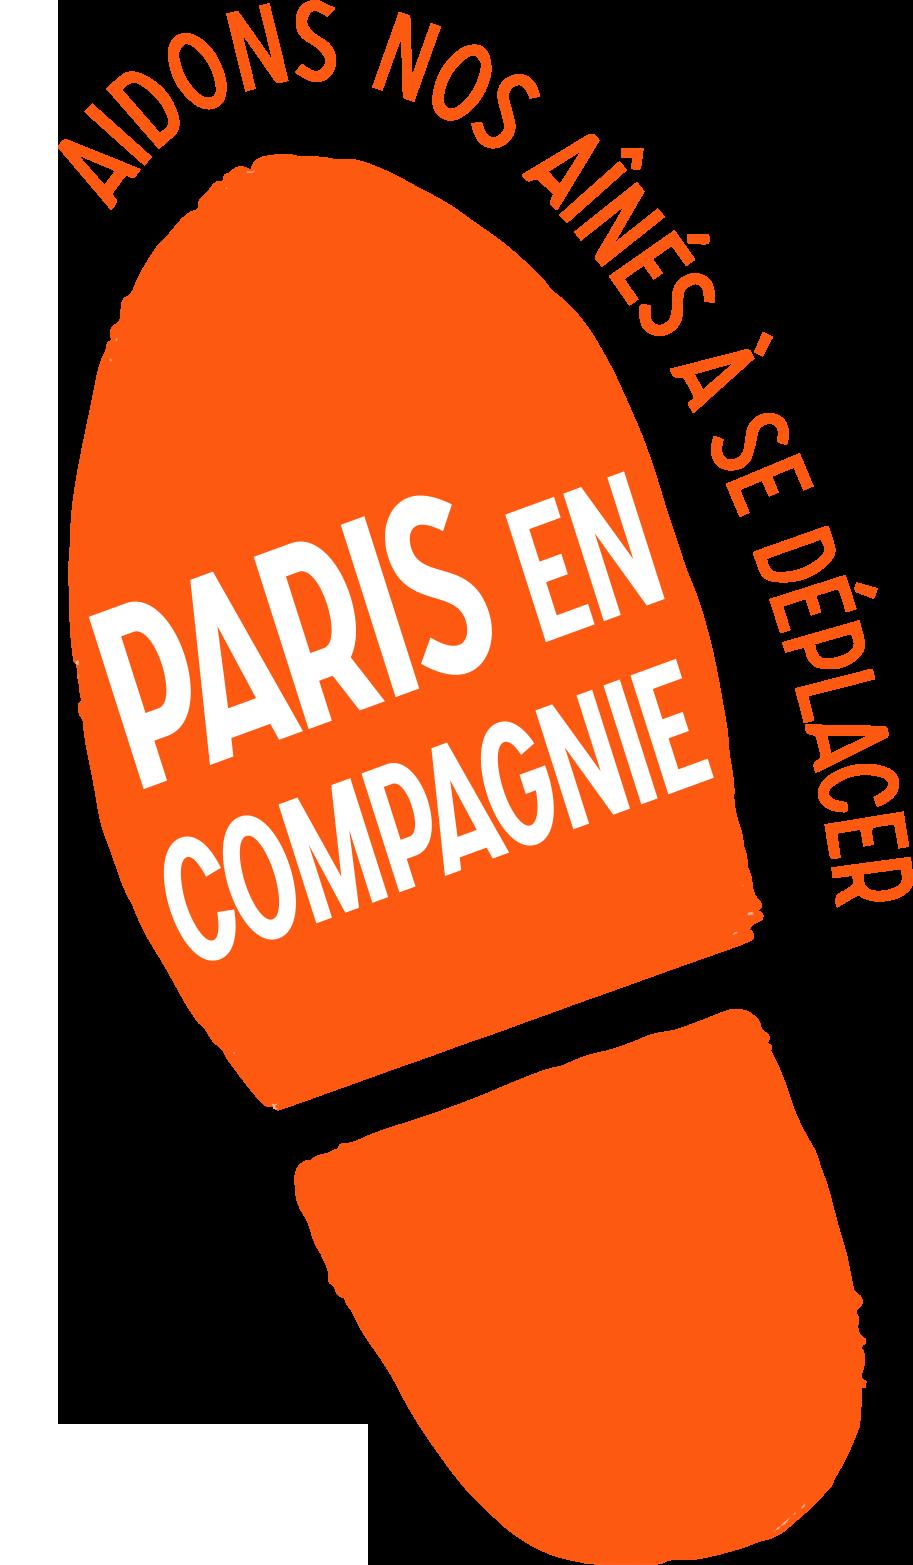 Paris en Compagnie